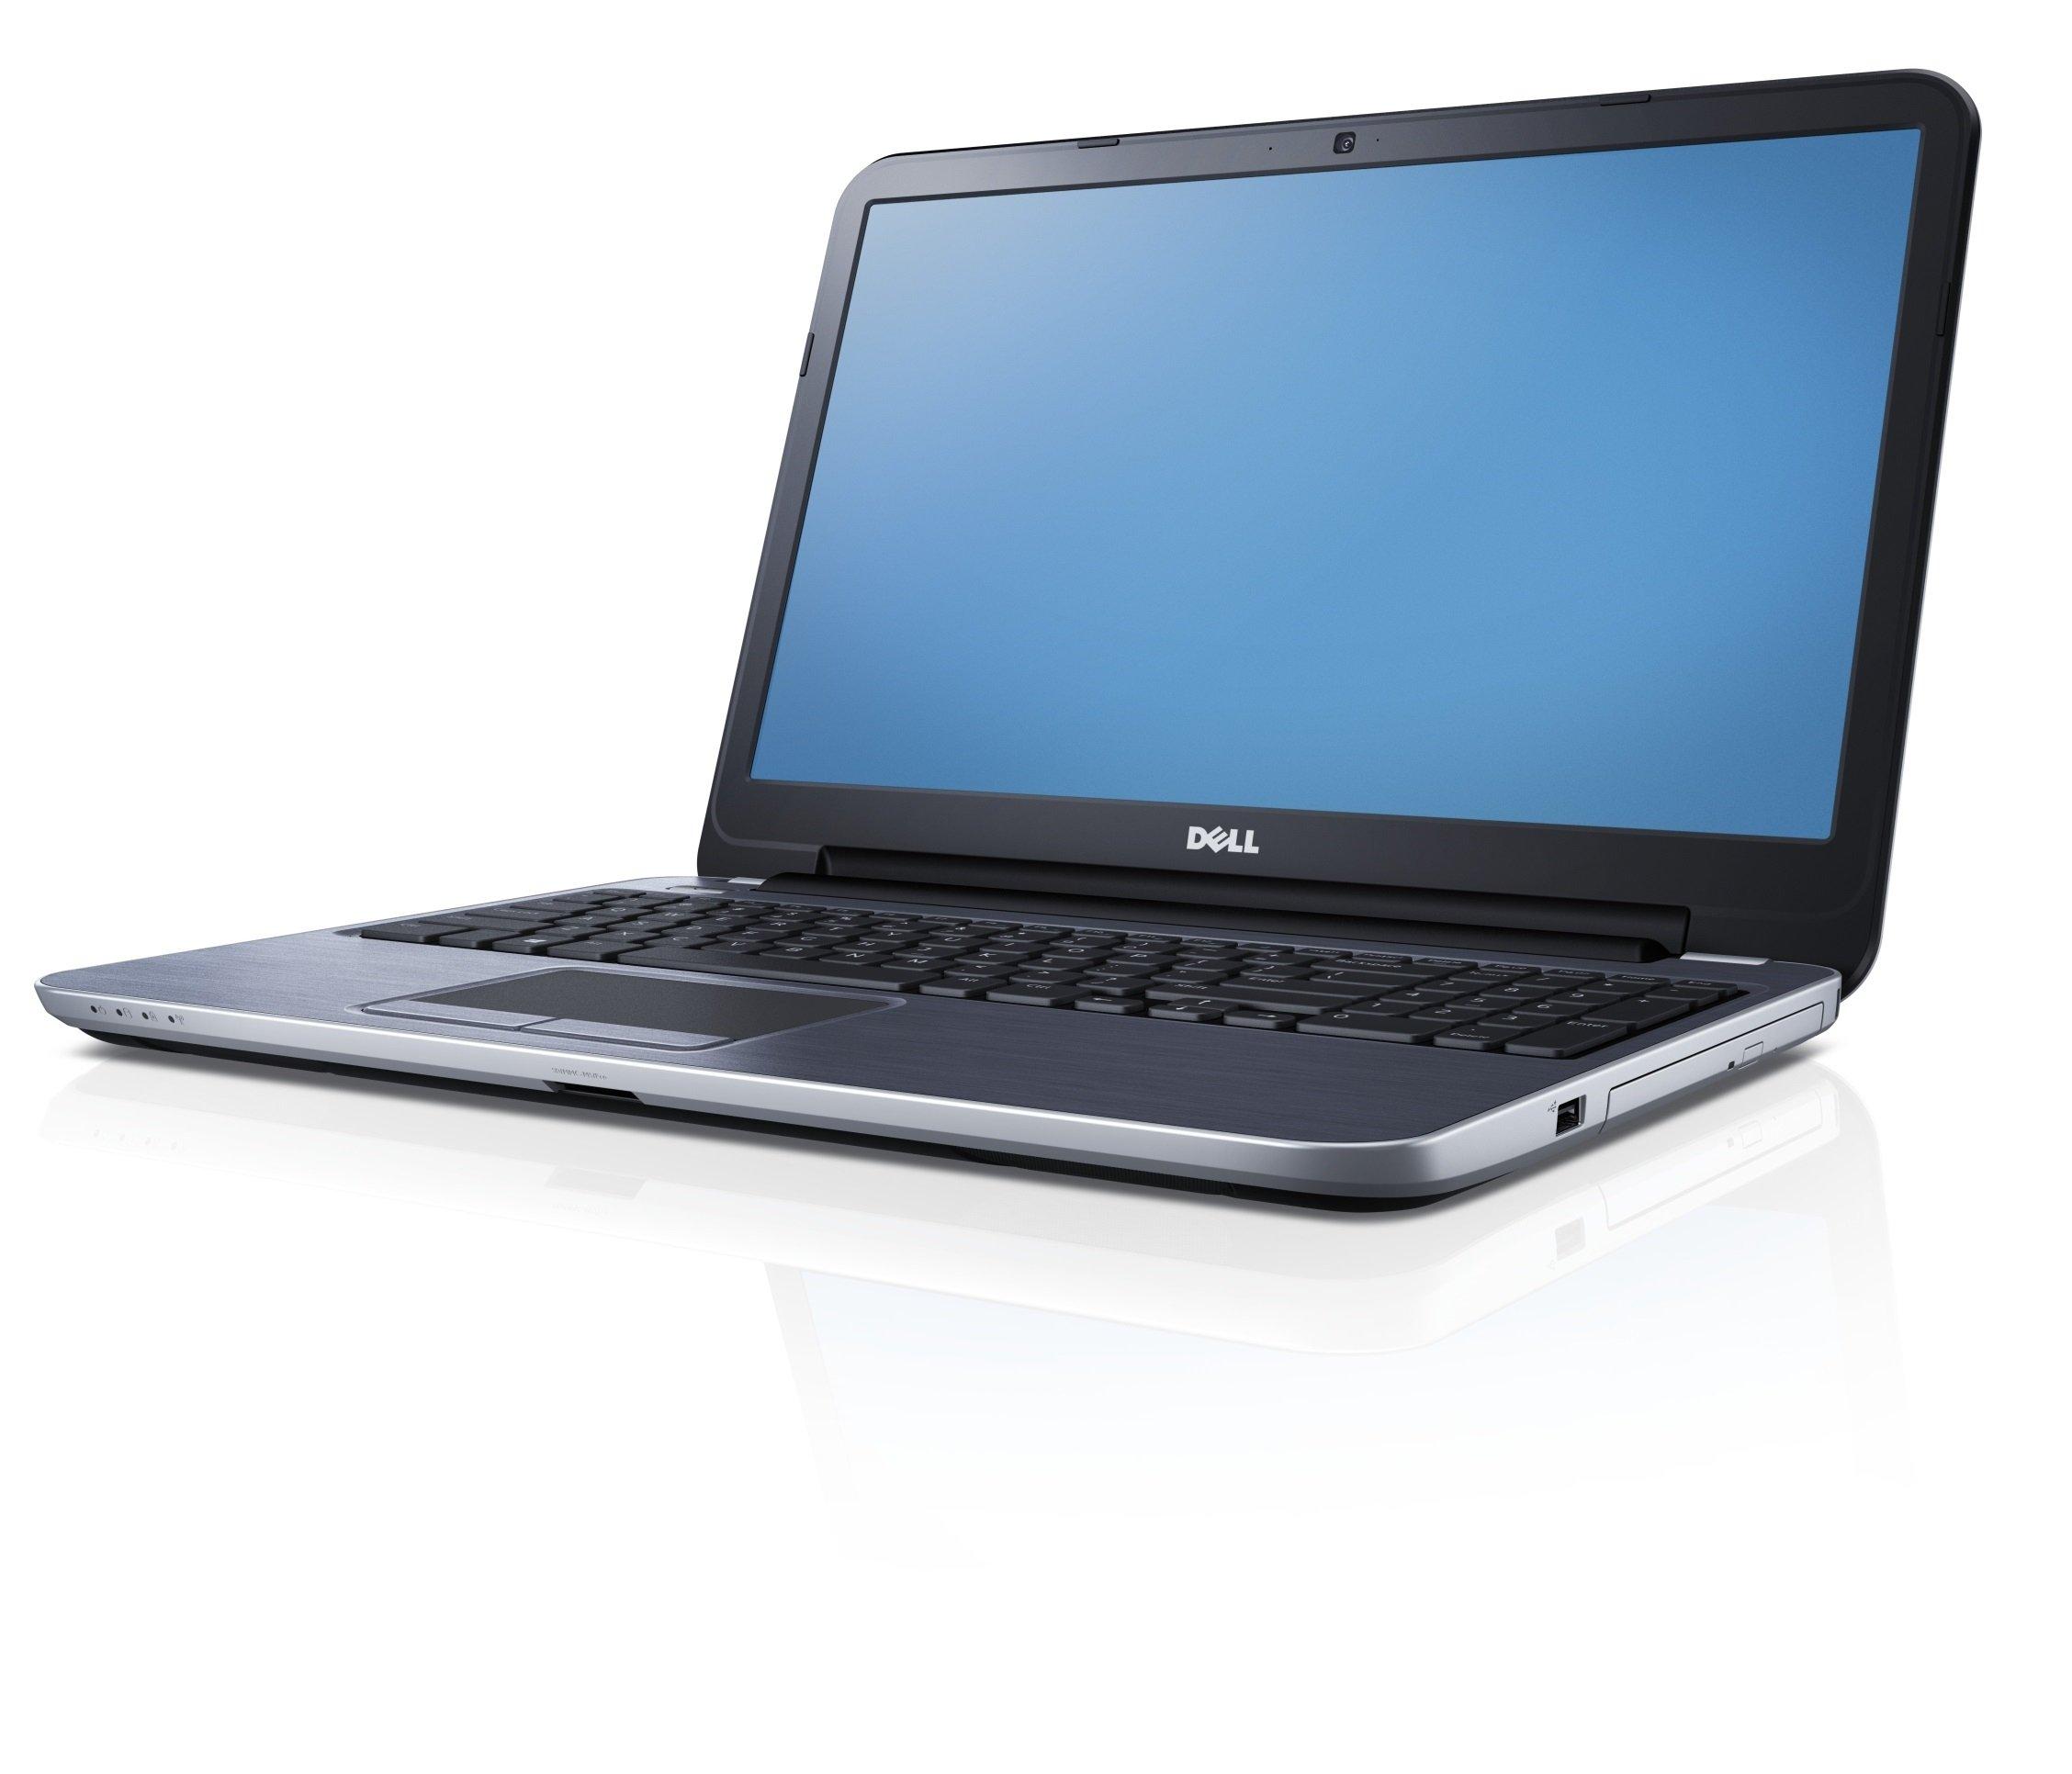 Dell Inspiron 15R i15RM-7537sLV 15.6-Inch Laptop (2.0 GHz Intel Core i7-3537U Processor, 8GB DDR3, 1TB HDD, Windows 8) Moon Silver [Discontinued By Manufacturer]